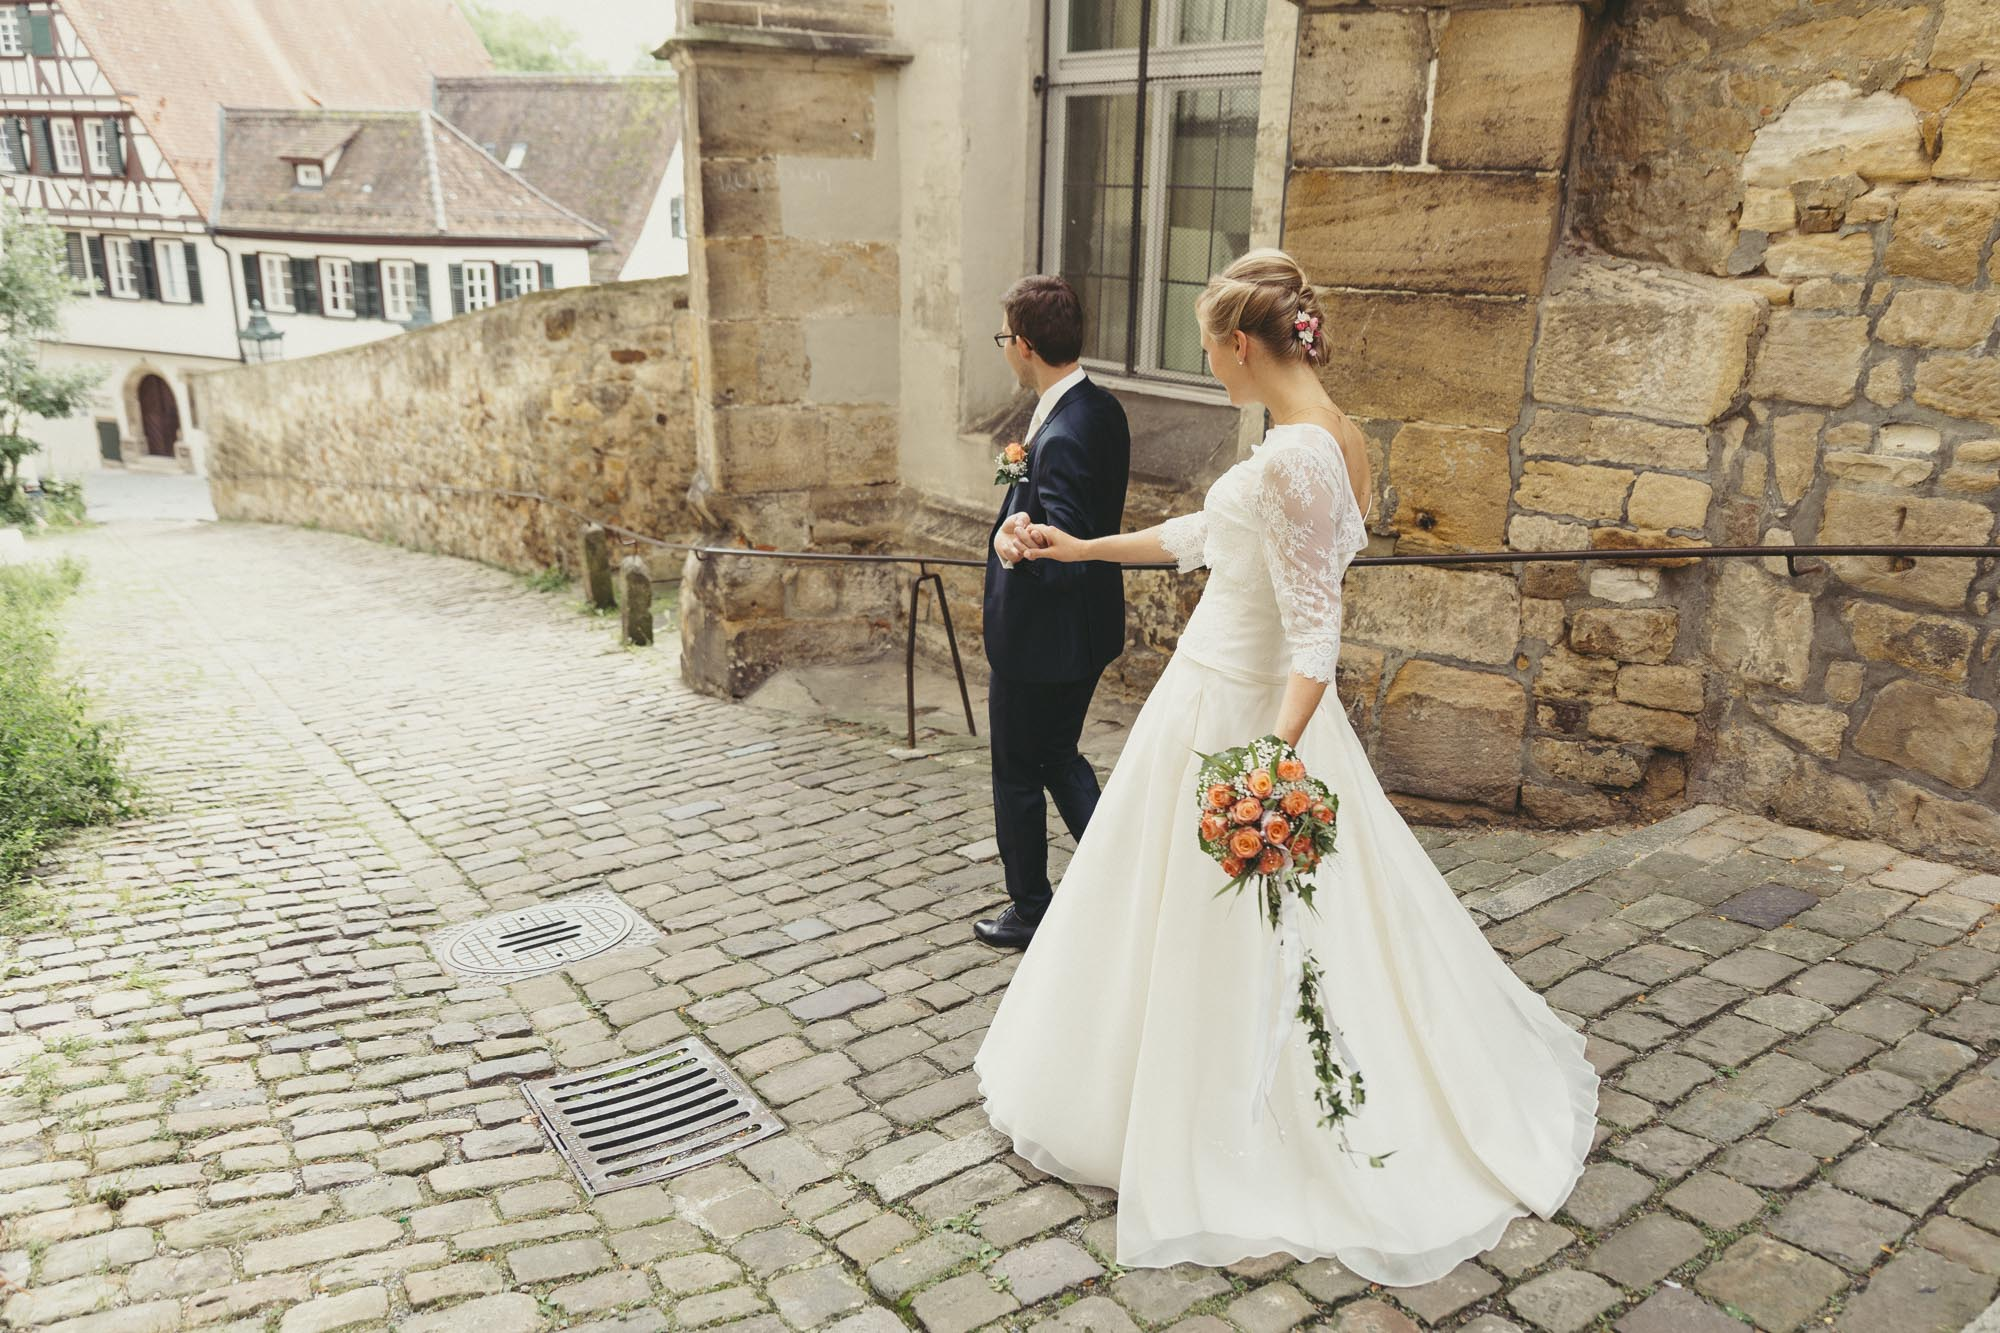 Hochzeitsfotografie-Tuebingen-Doro-Stefan-12